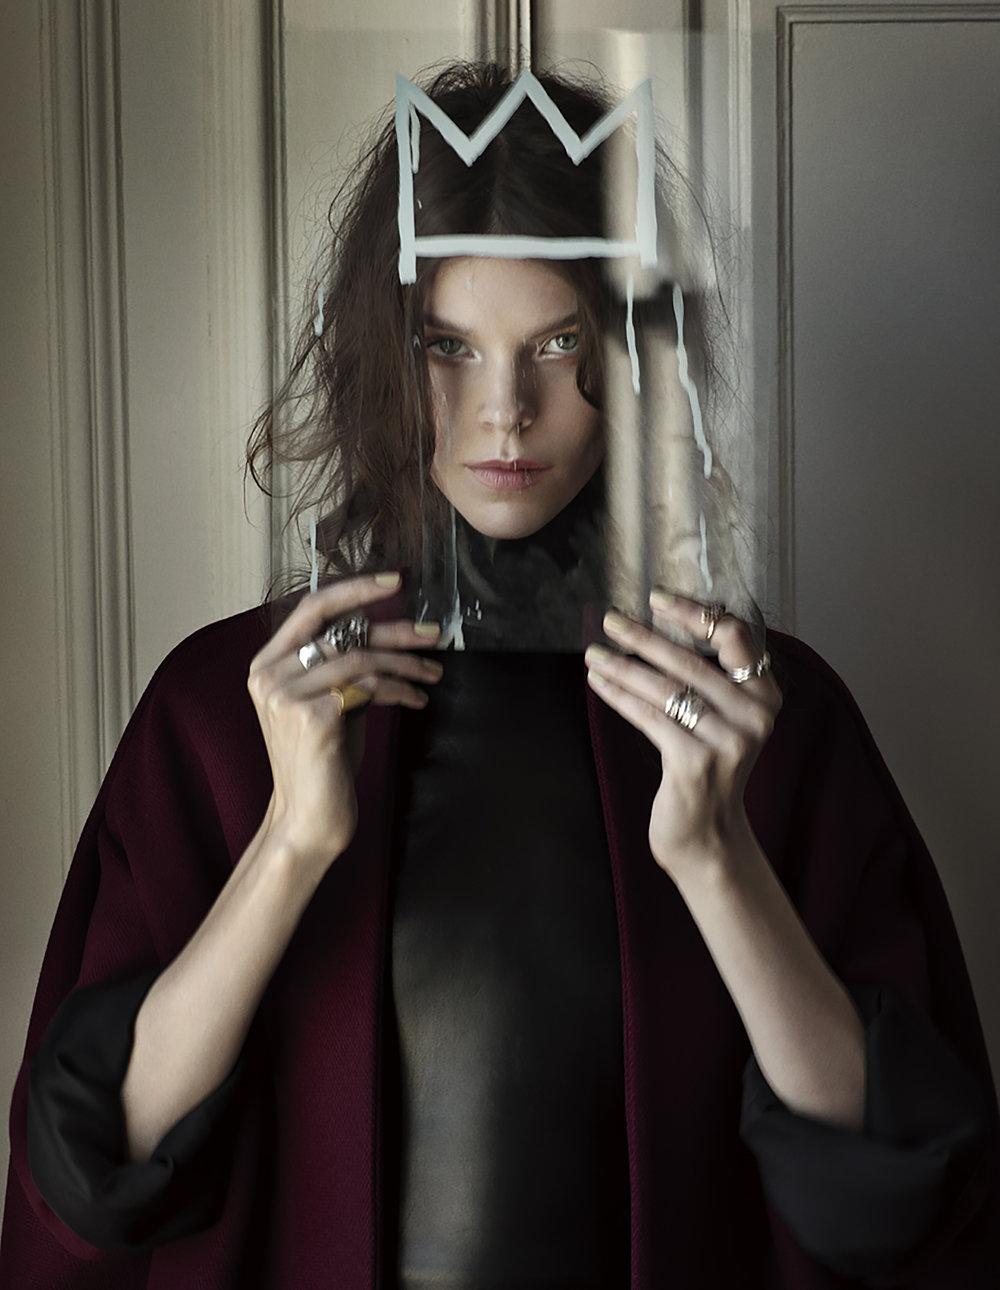 1401-VogueJapan-PortraitOfAnArtist-MSL_LMN-02.jpg